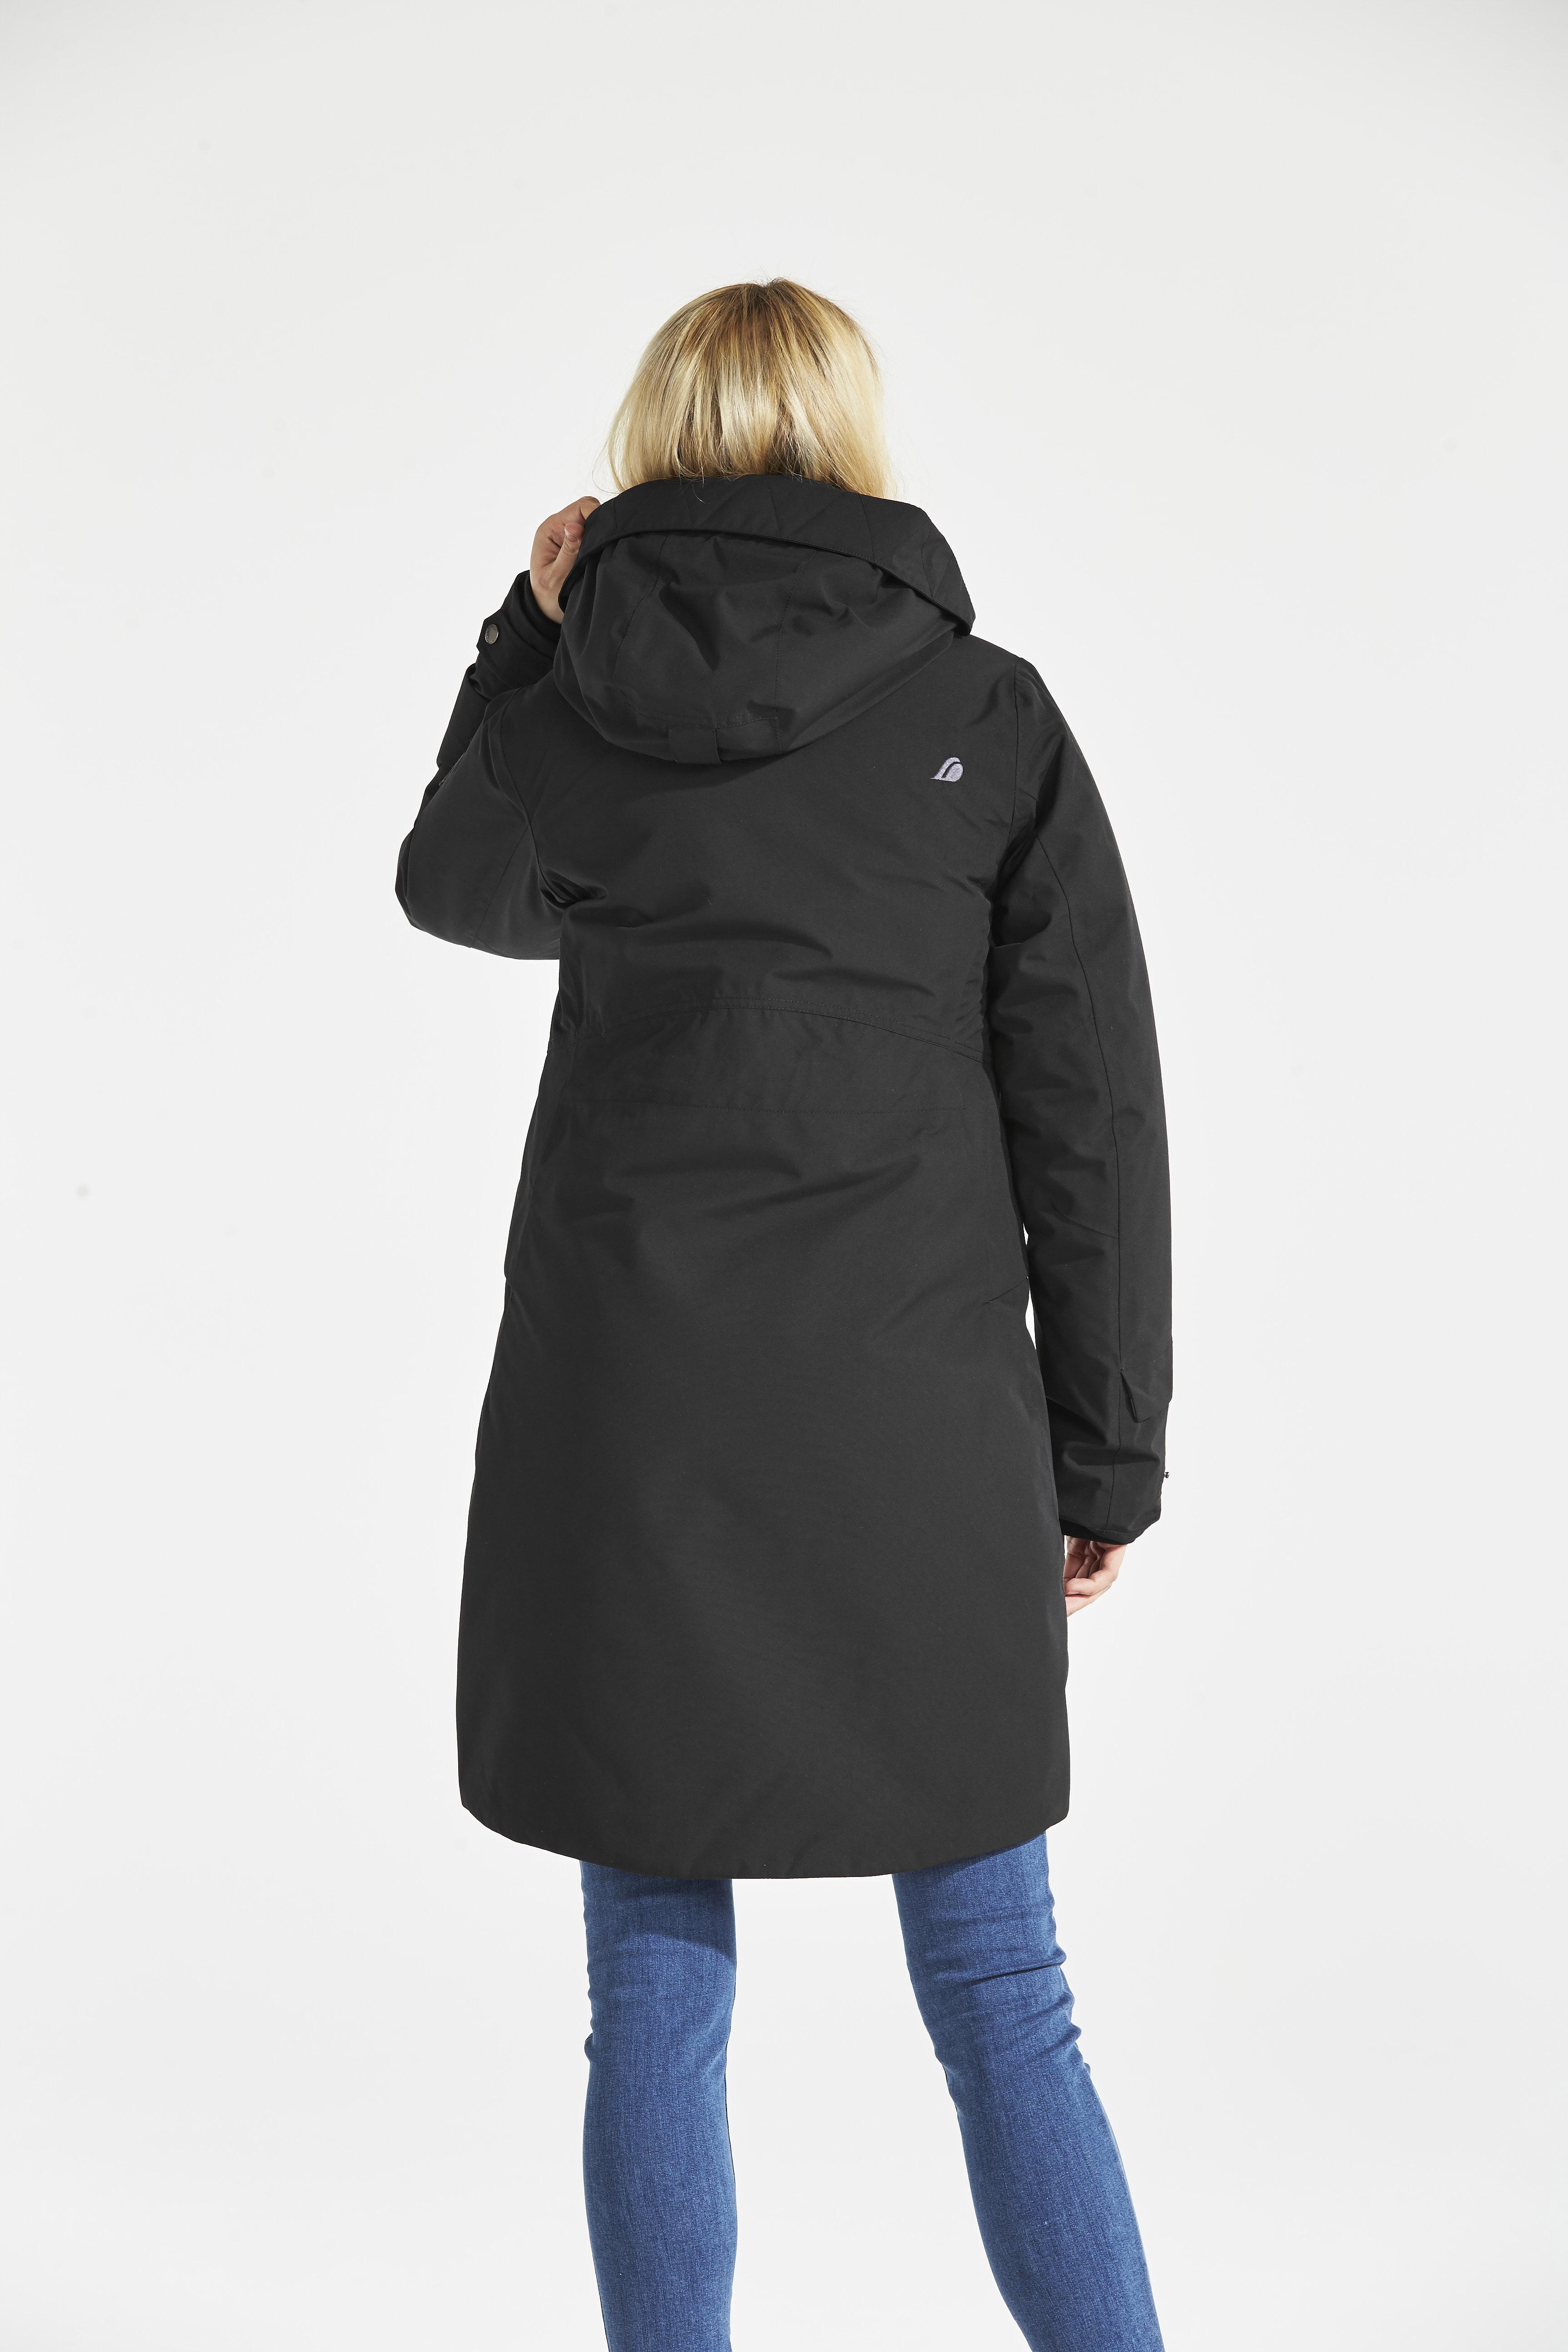 Køb Didriksons Vinterjakke Dame Eline DI501836